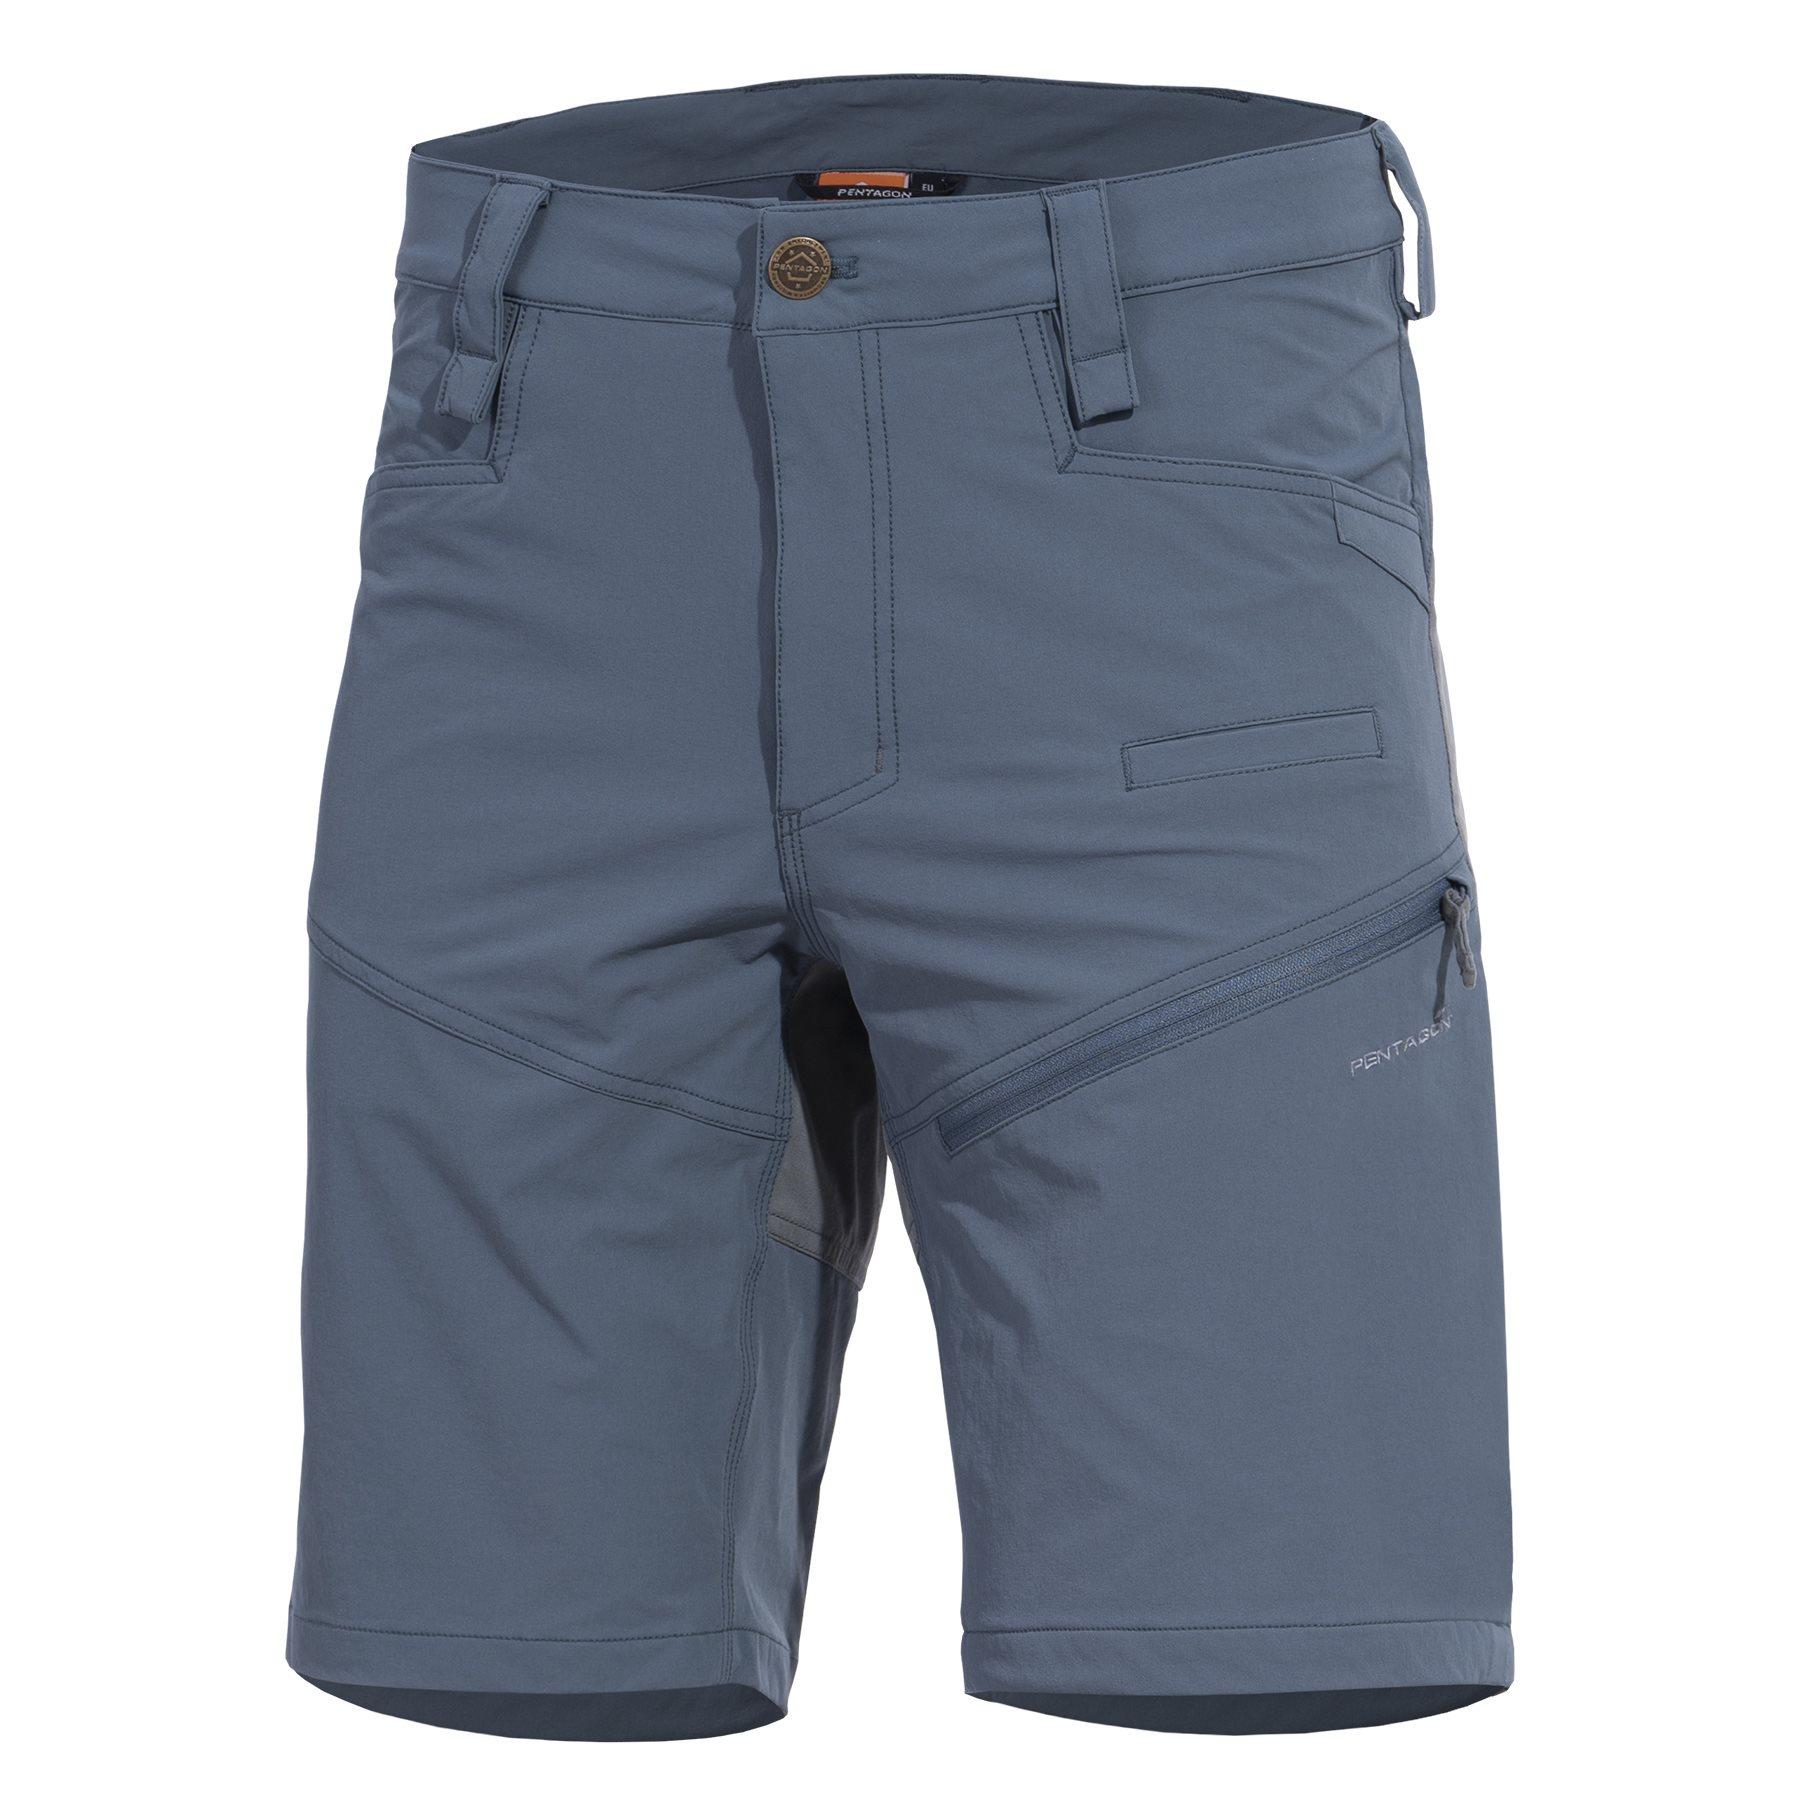 Shorts RENEGADE SAVANNA CHARCOAL BLUE PENTAGON K05049-76 L-11